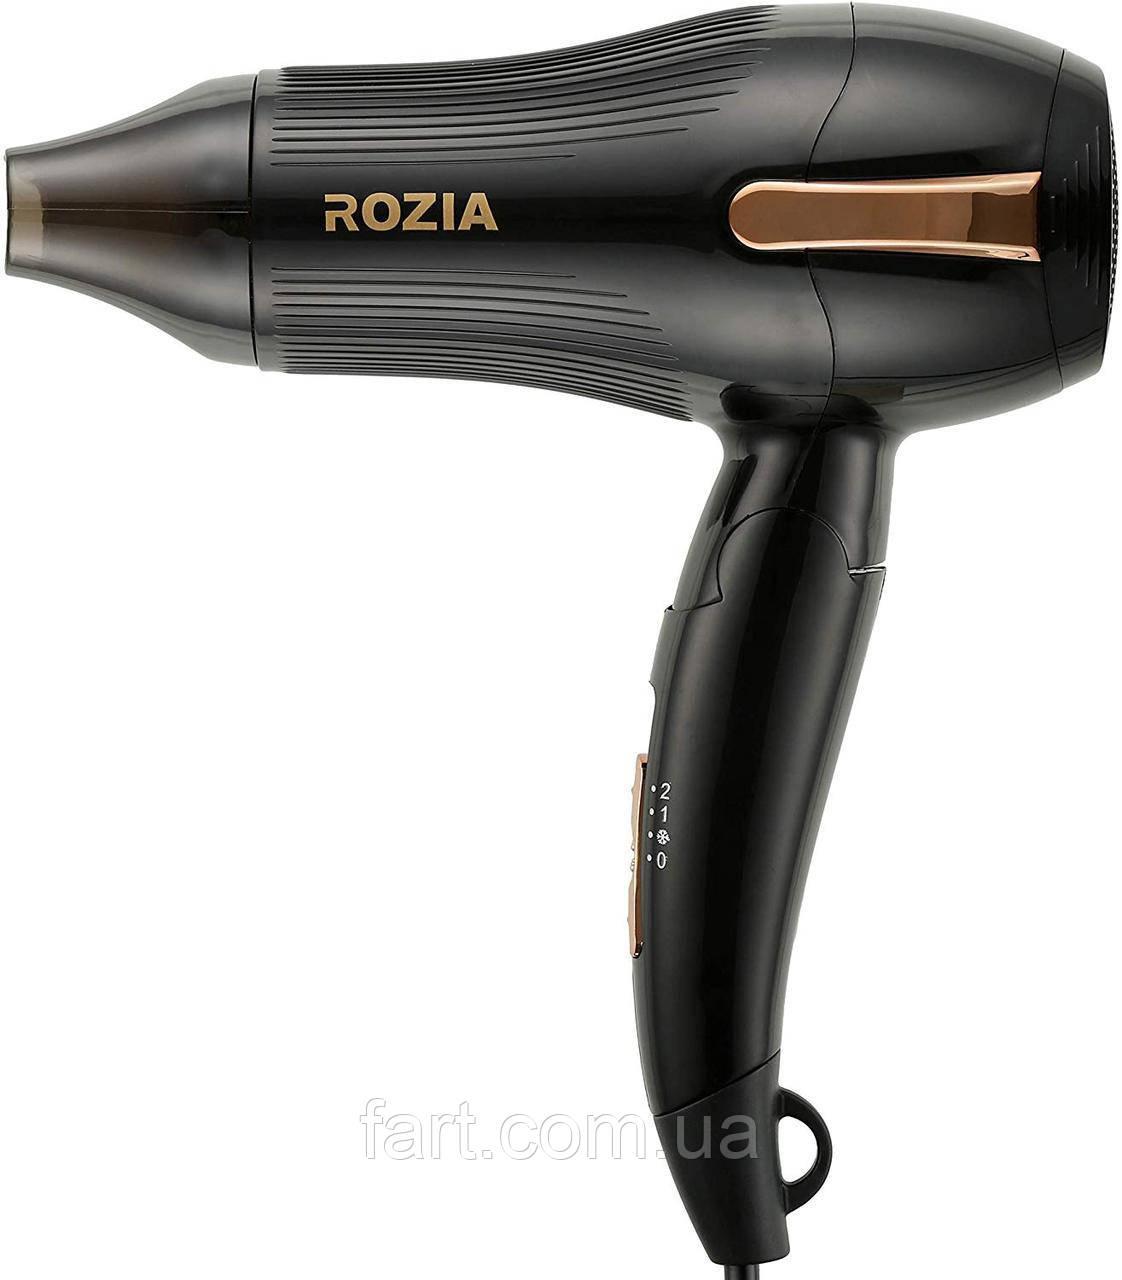 Фен для волос ROZIA HC-8170